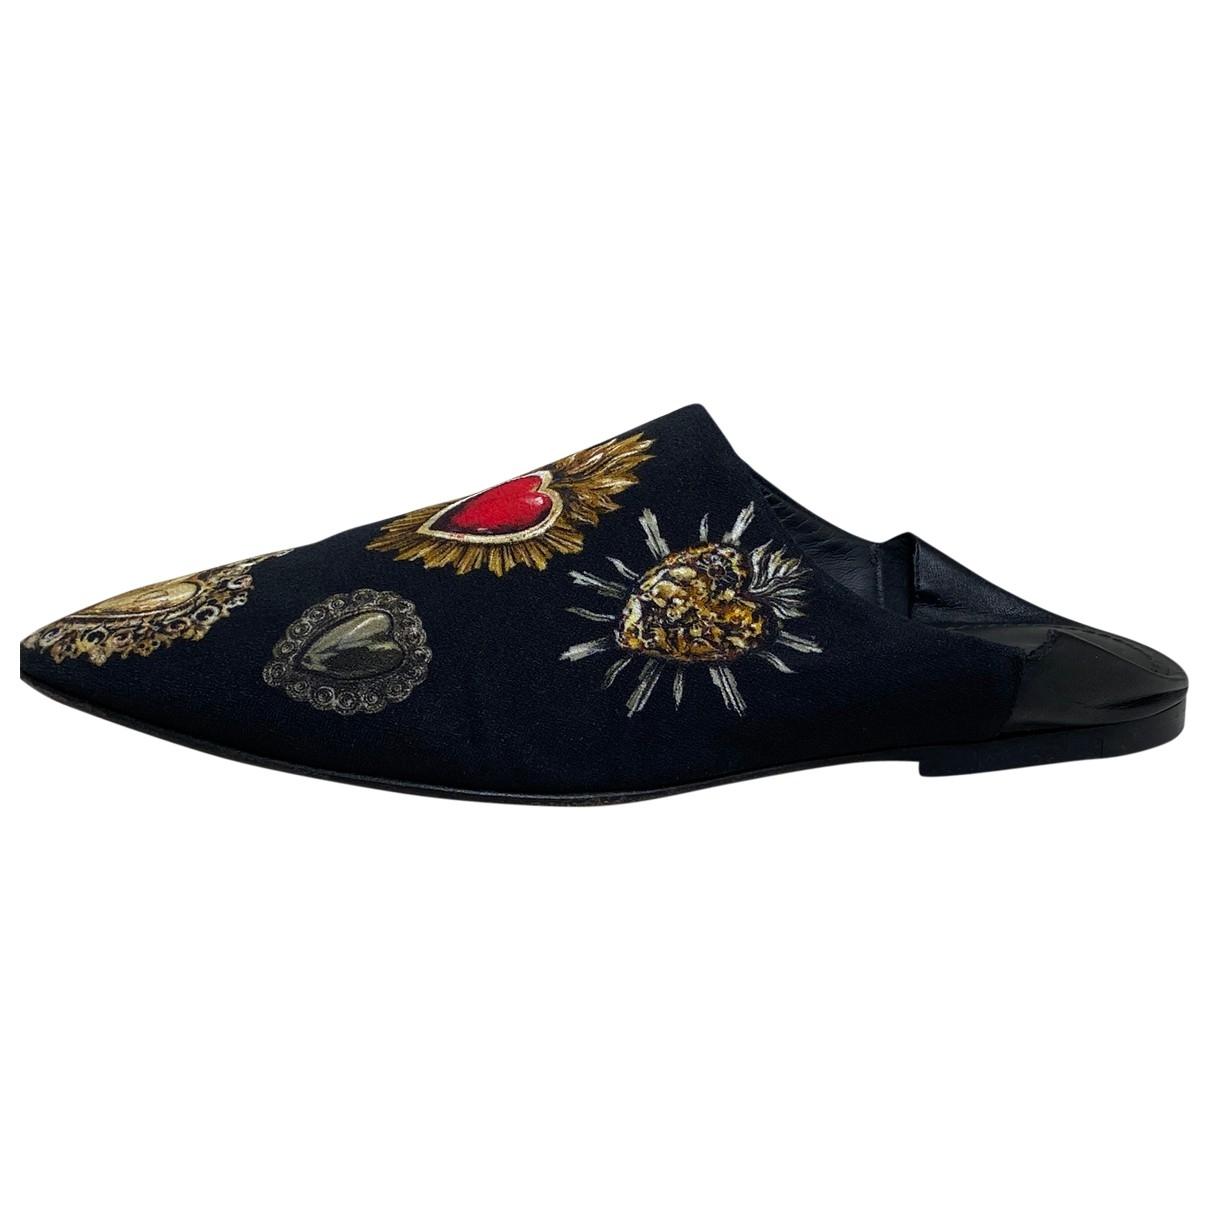 Dolce & Gabbana \N Black Cloth Sandals for Women 38 EU